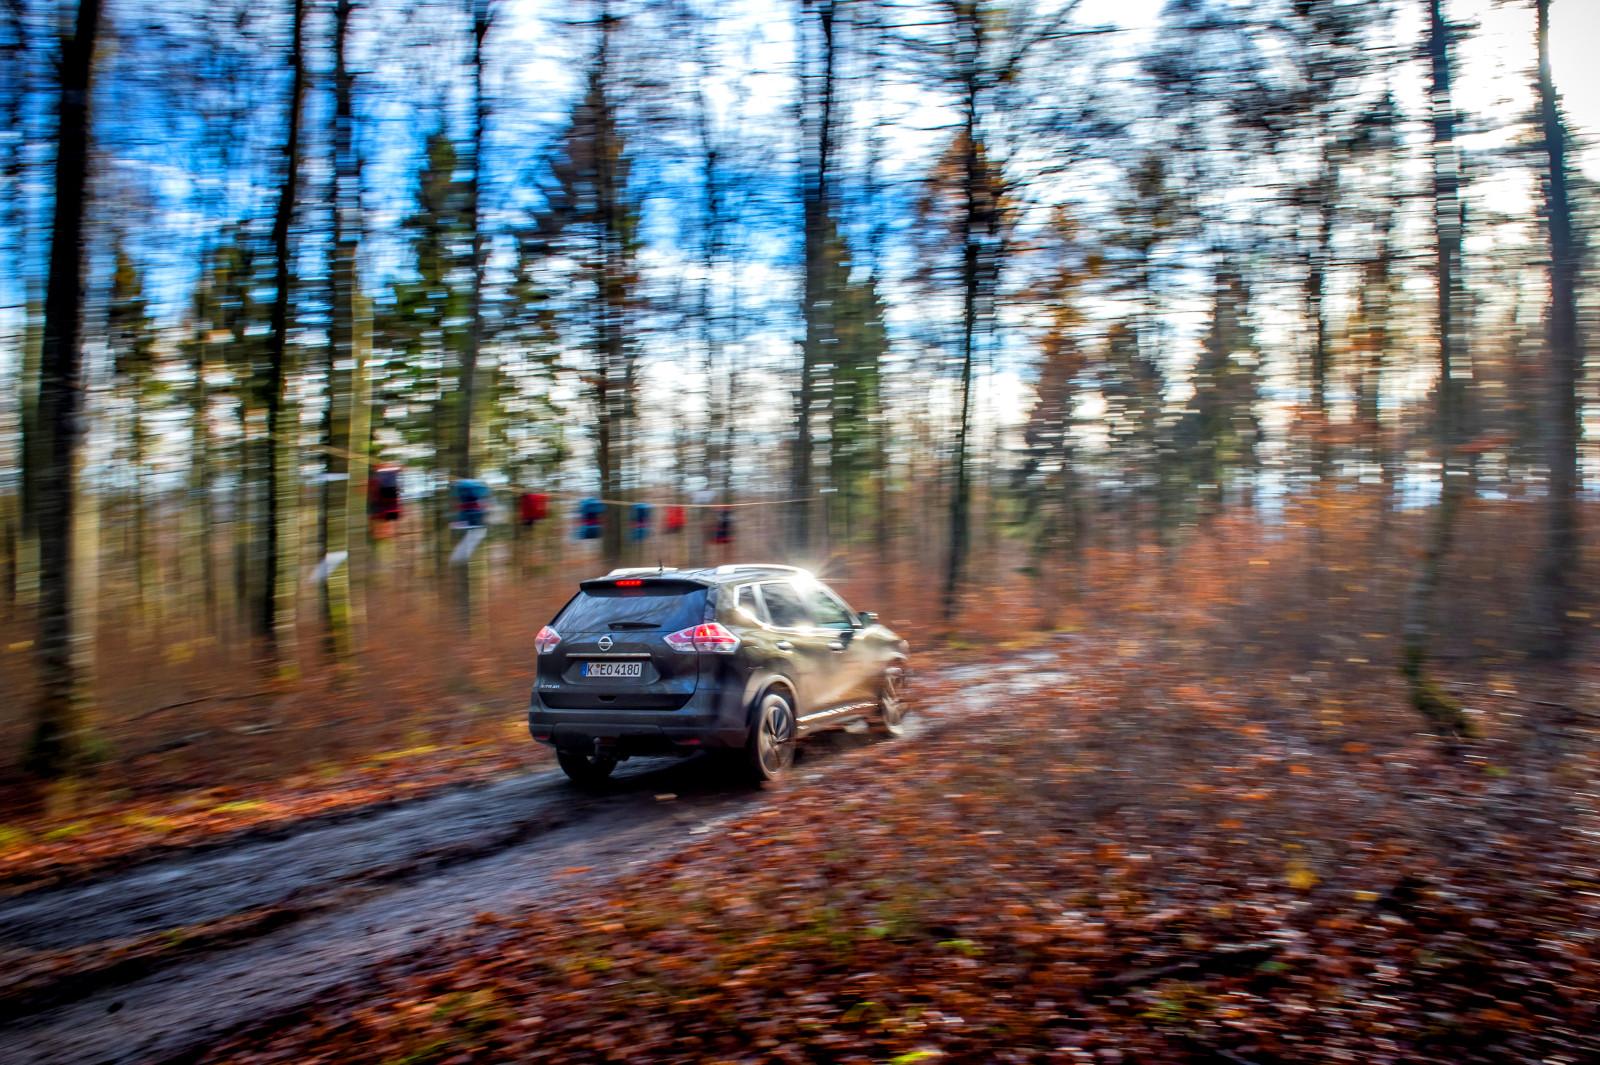 Nissan X-Trail 2.0-litre diesel